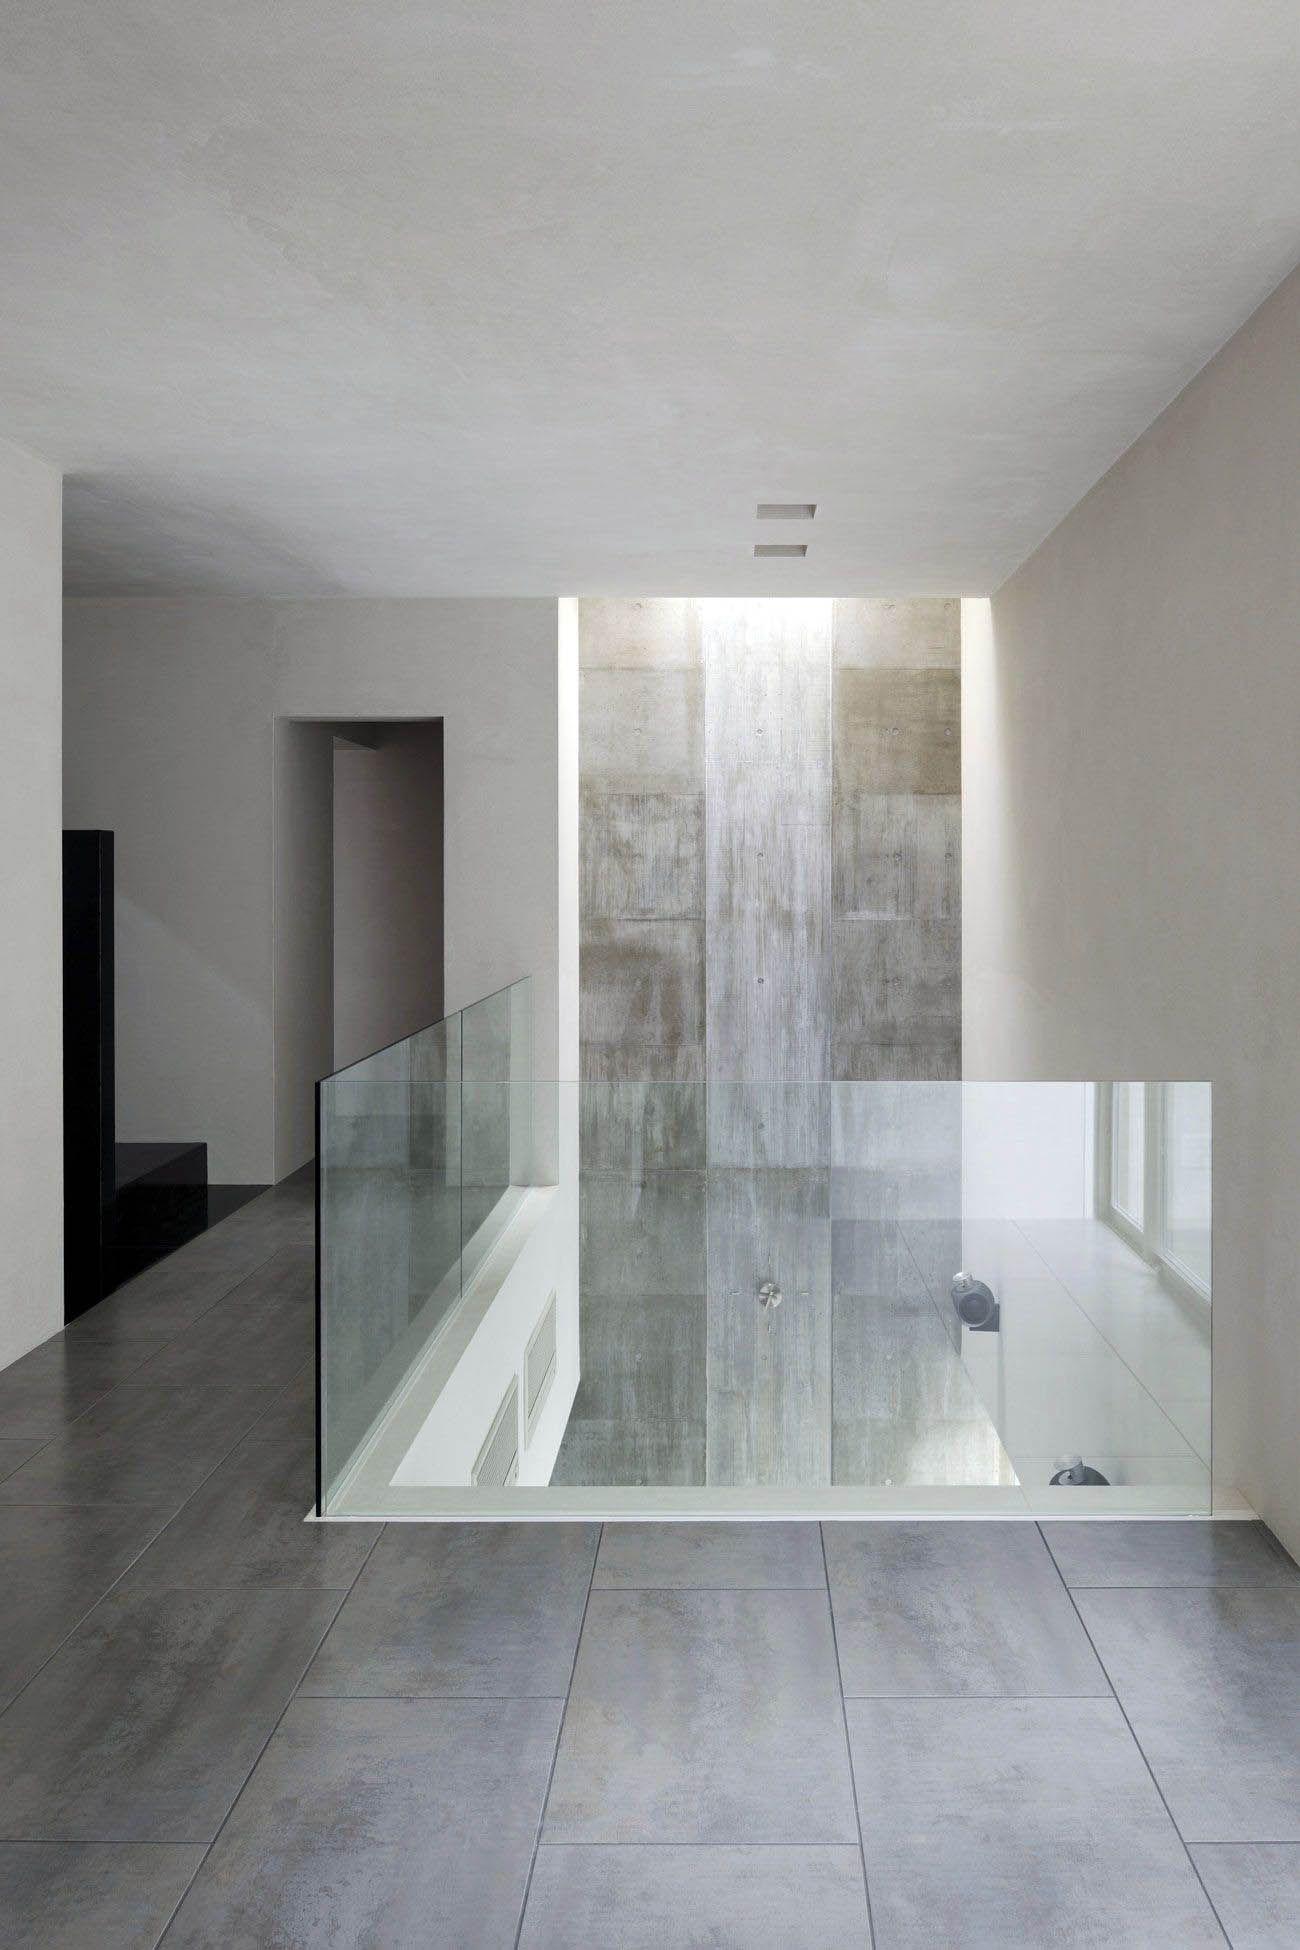 Best Graceful Glass Railing For Revit That Look Beautiful 400 x 300